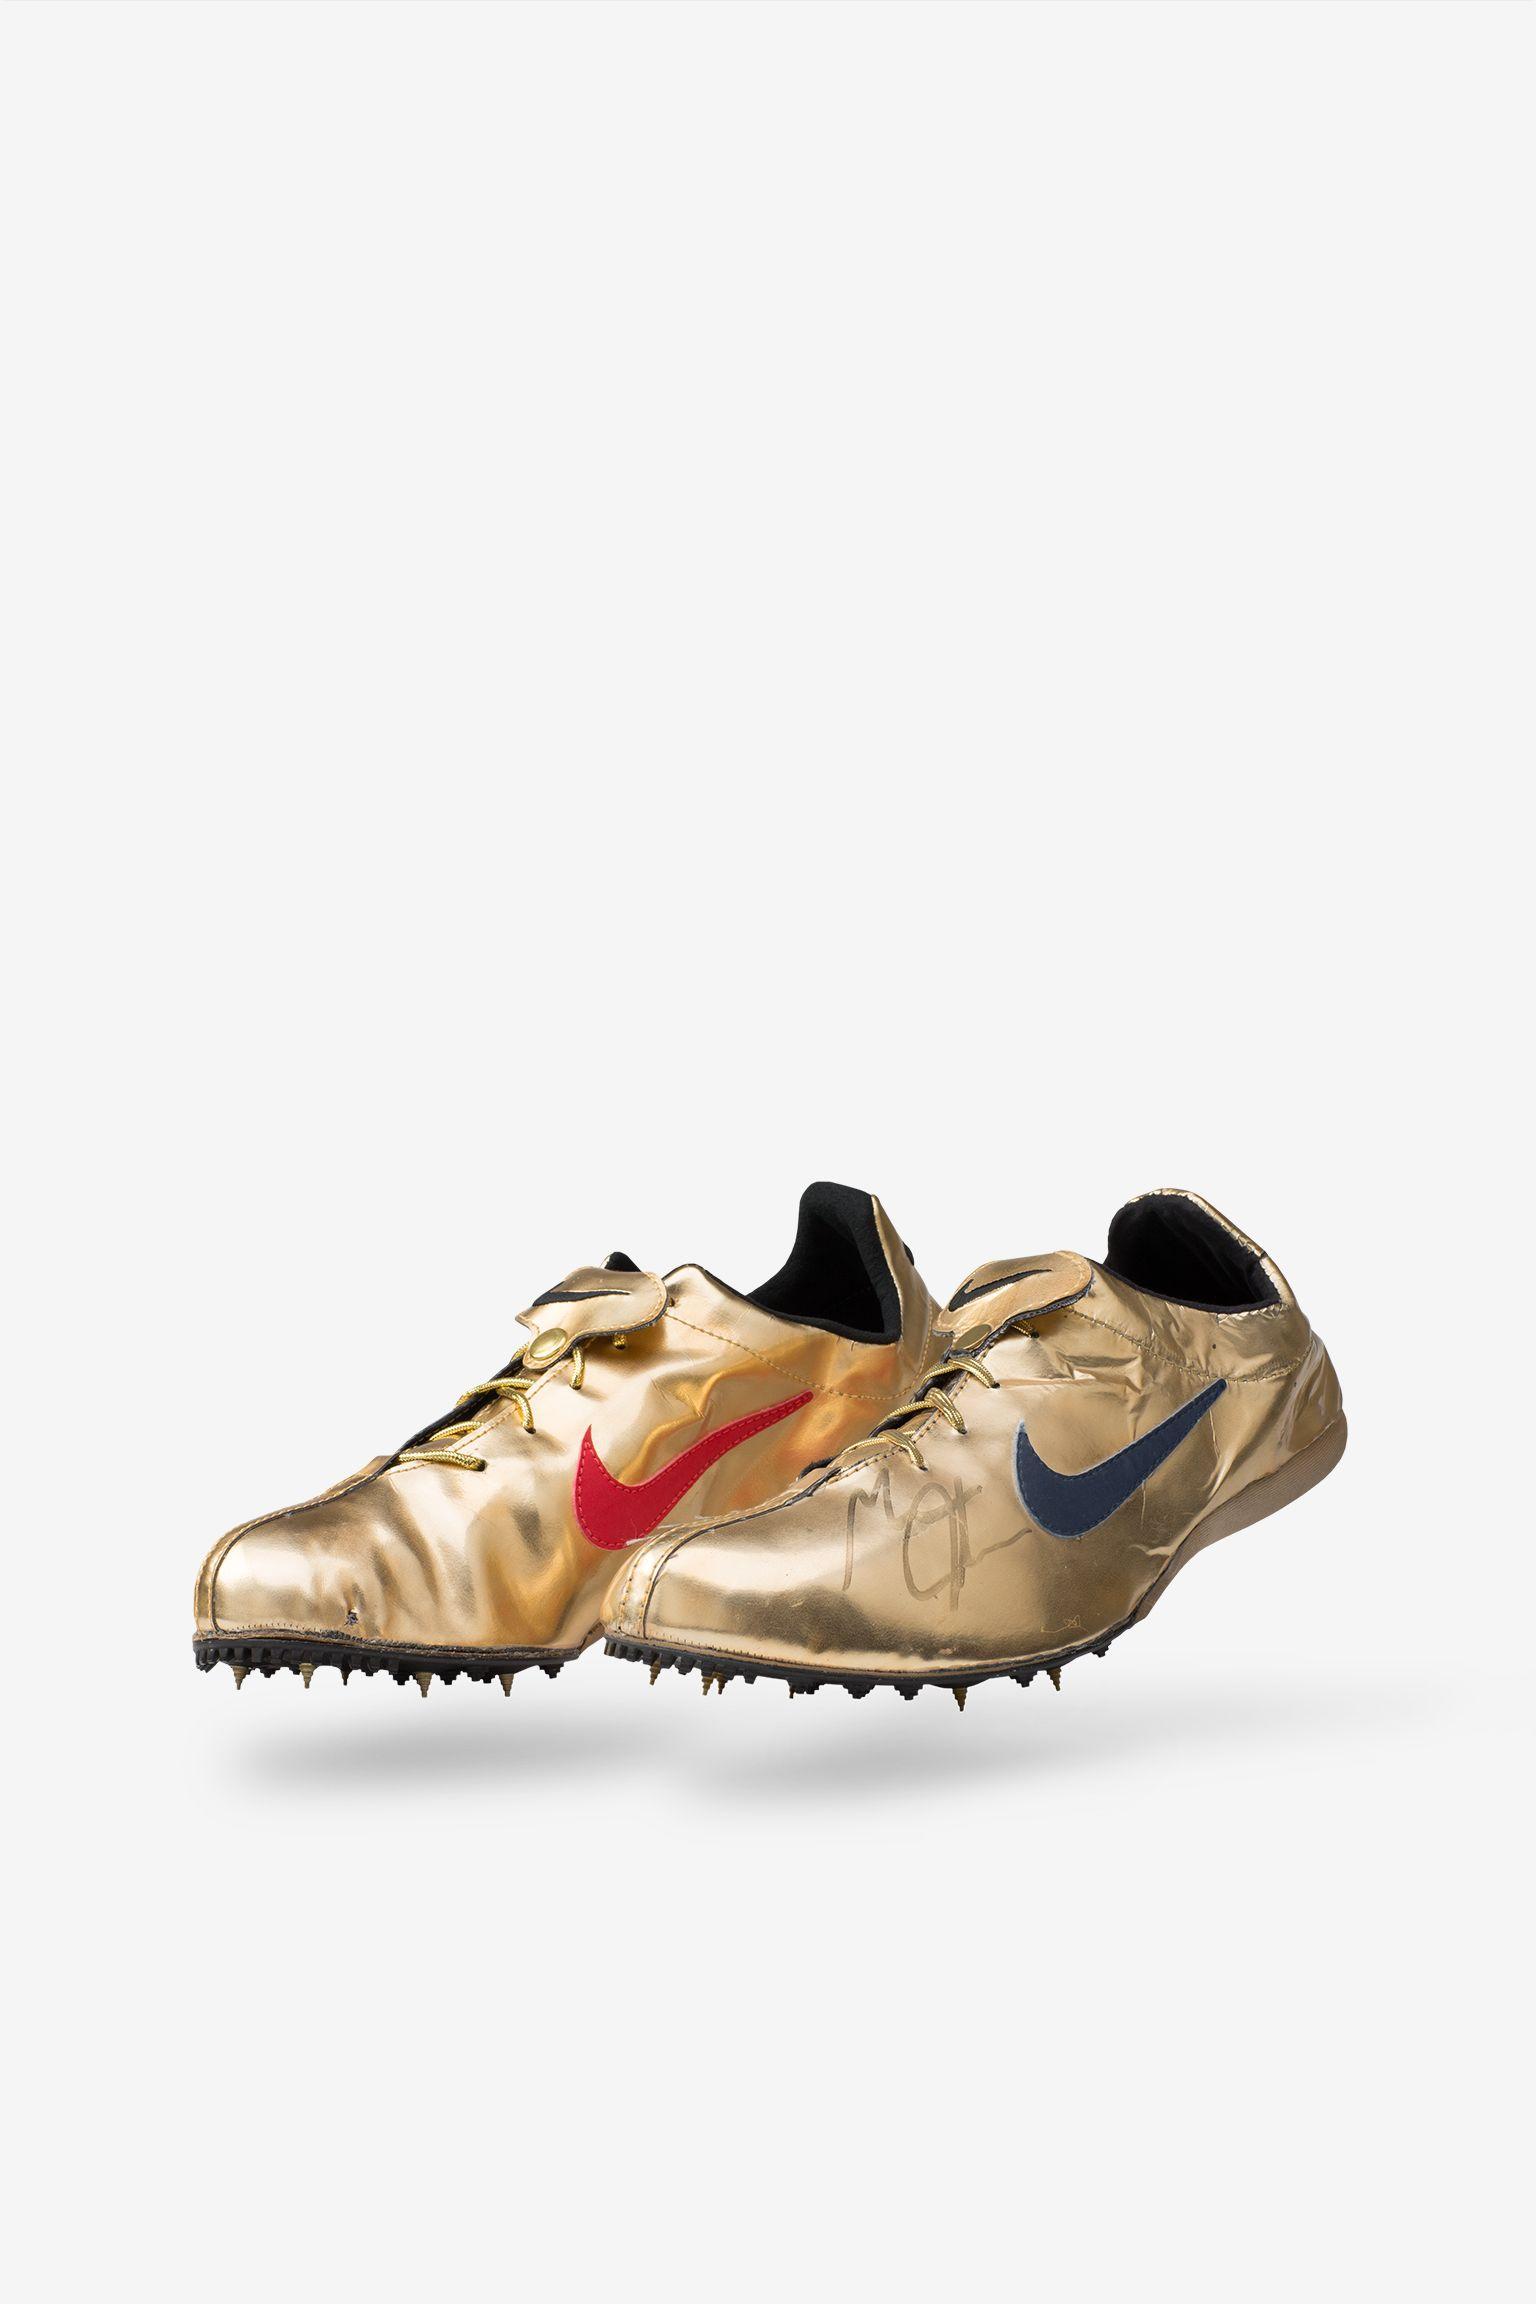 Dnes ve Sneakers: Golden Moment